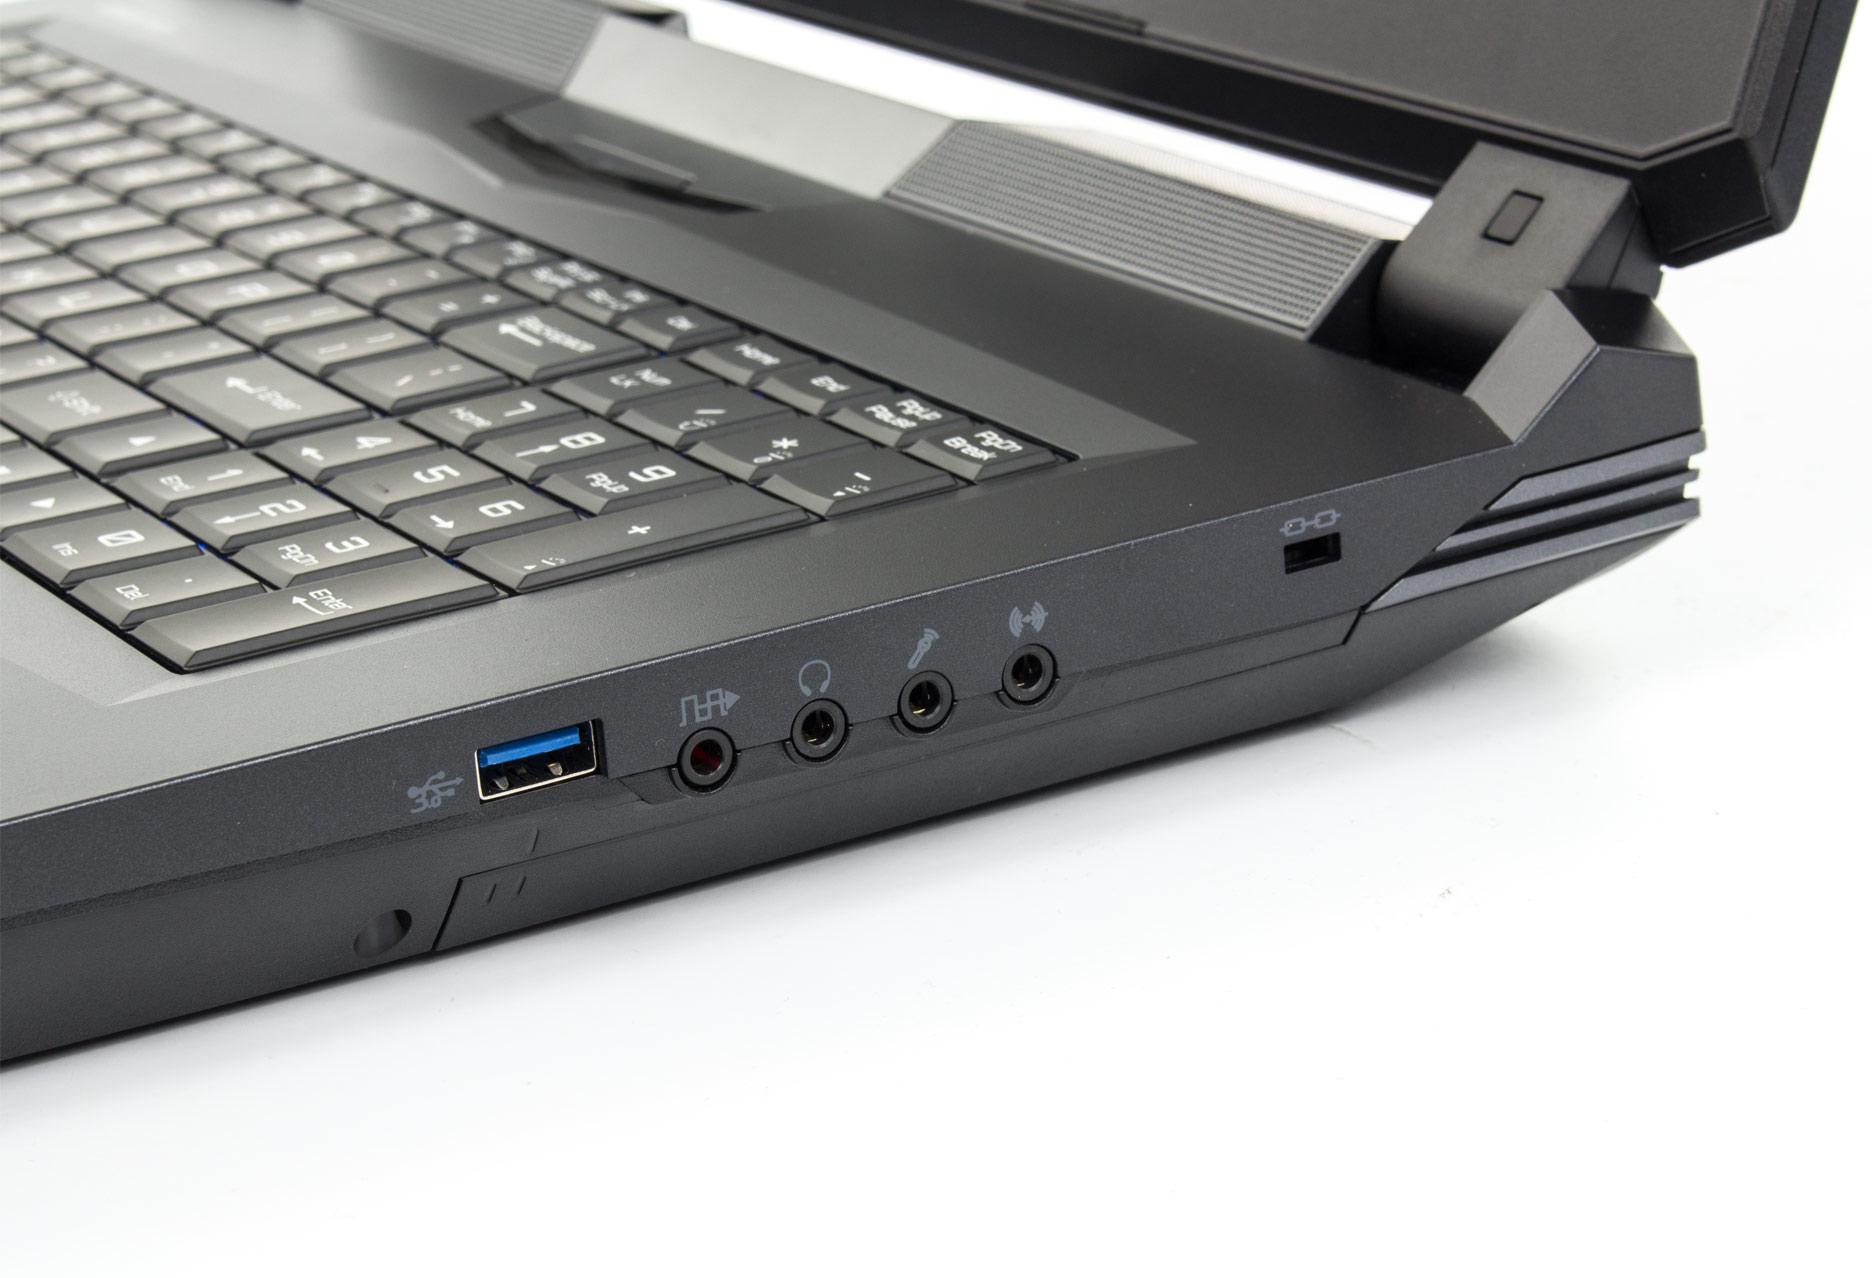 Hyperbook X77DM-G prawy bok